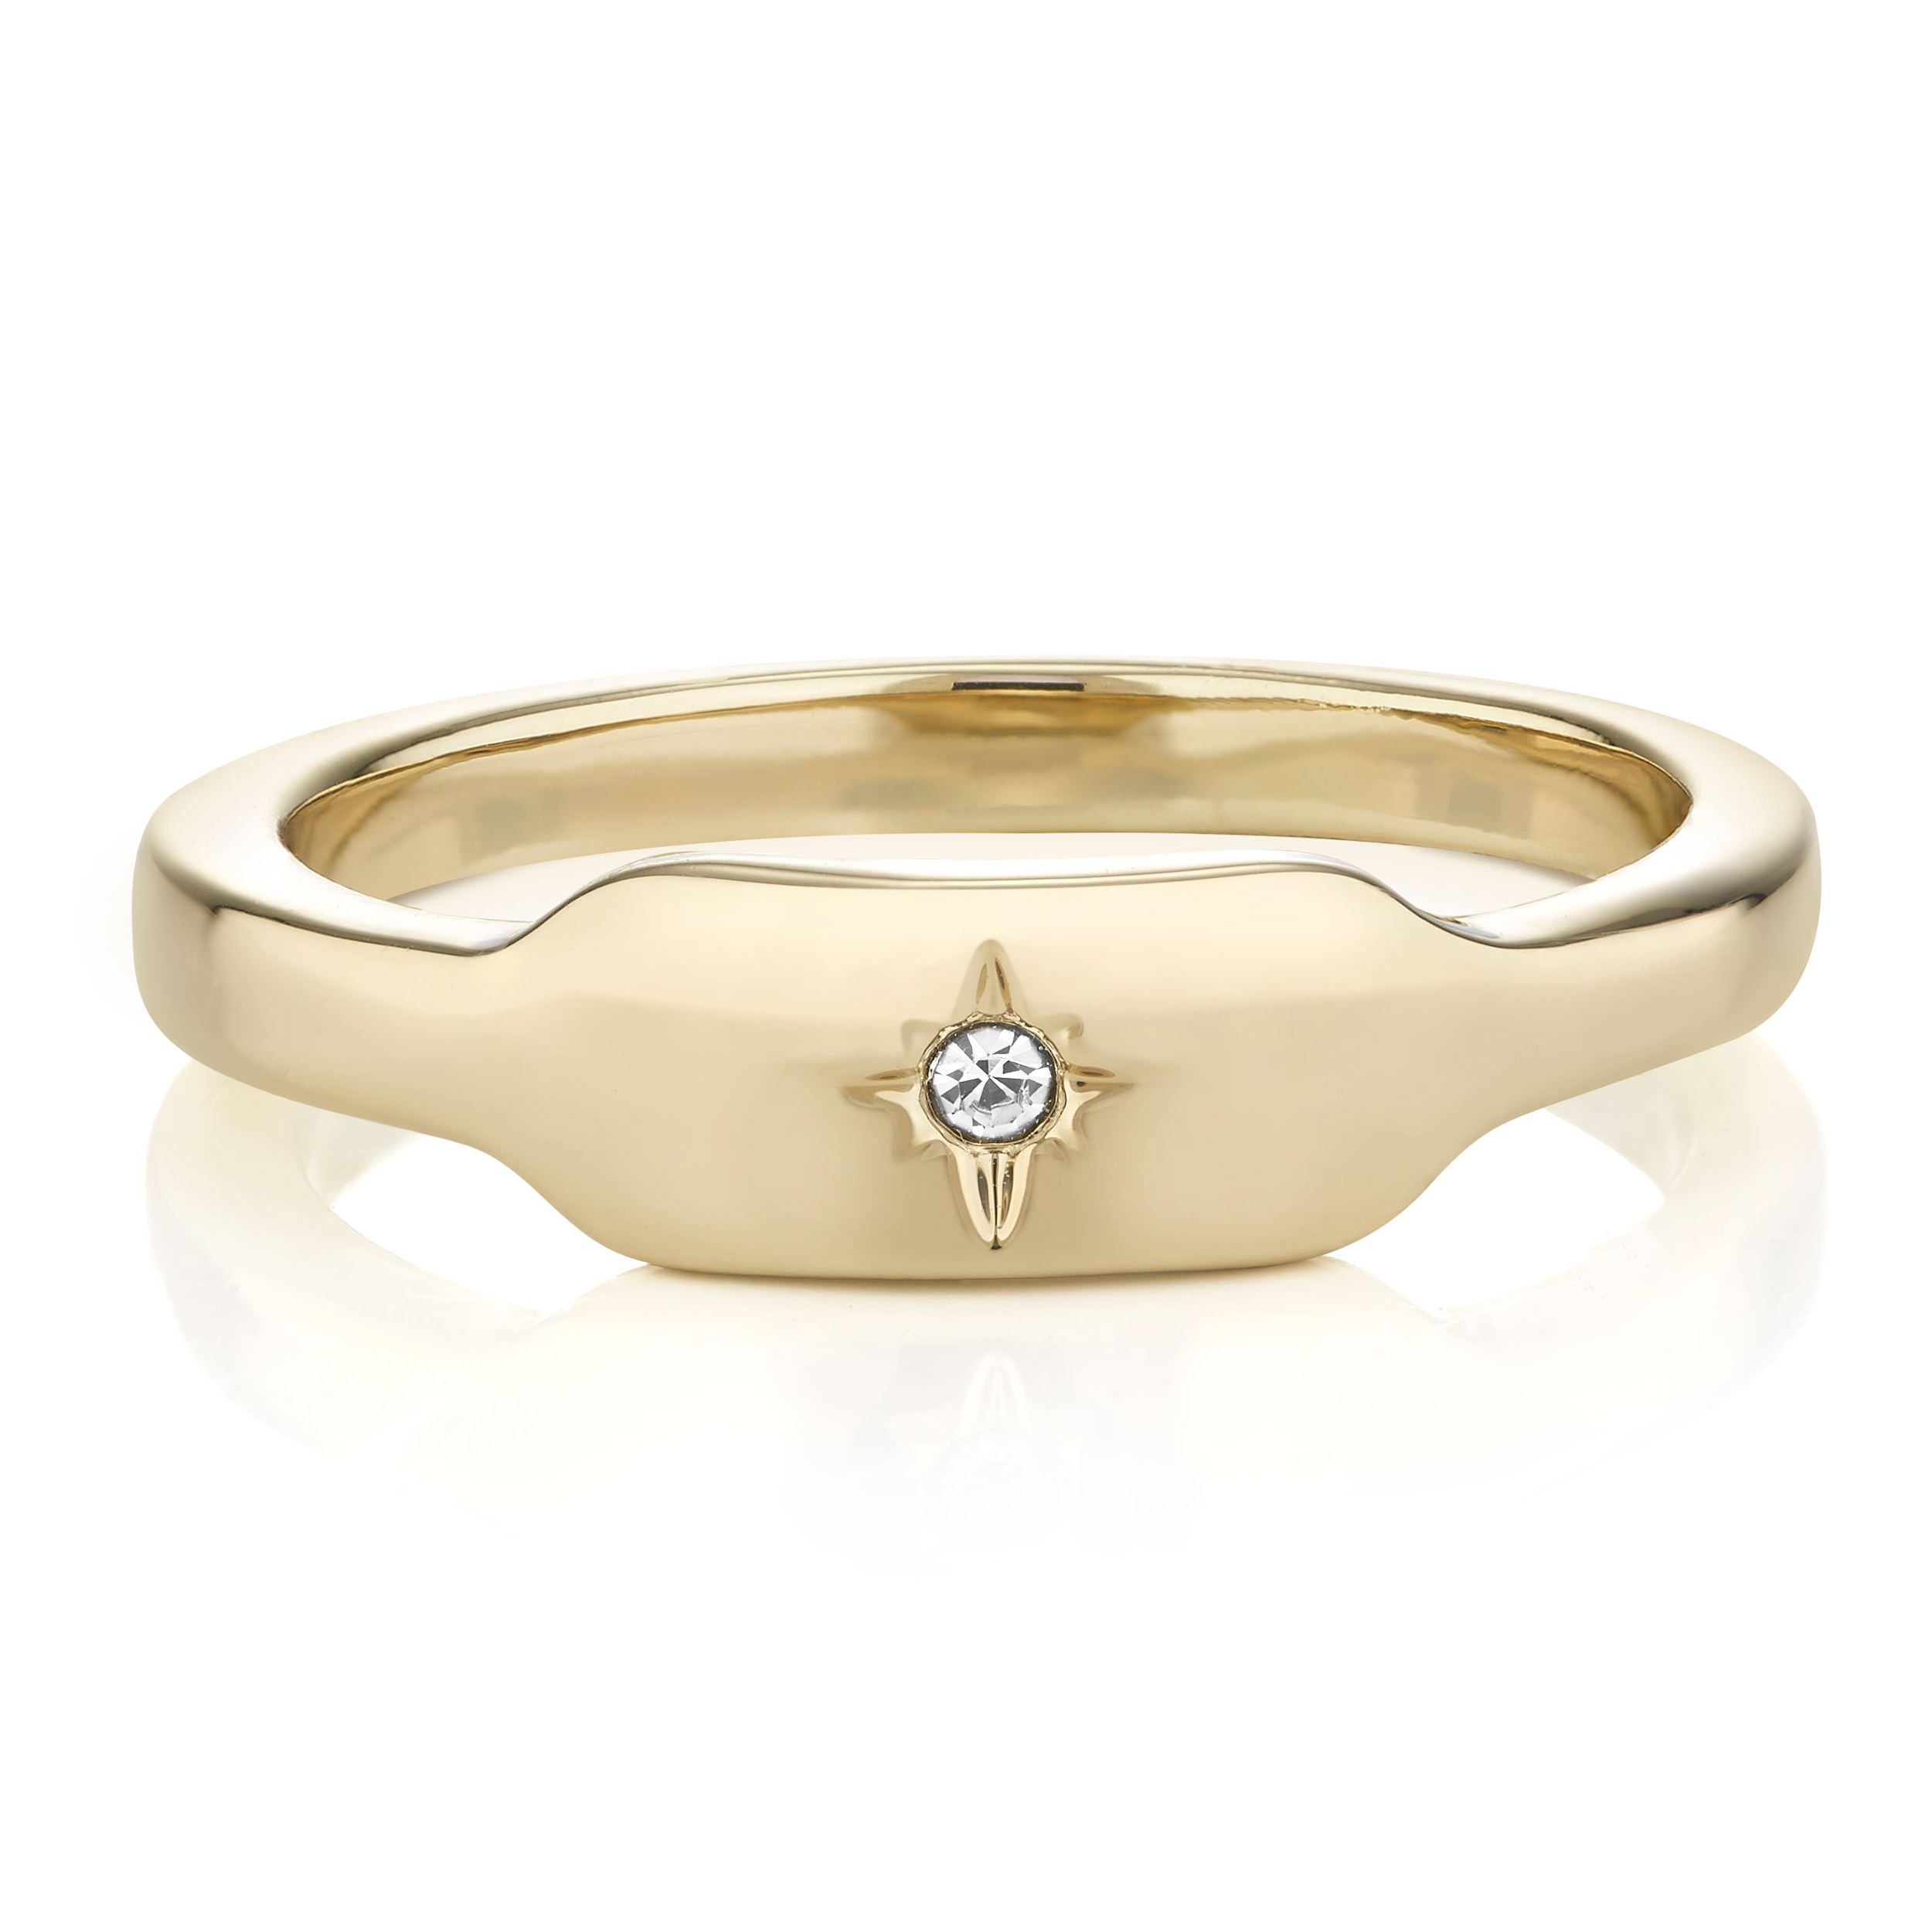 Buckley London Eyre Signet Ring